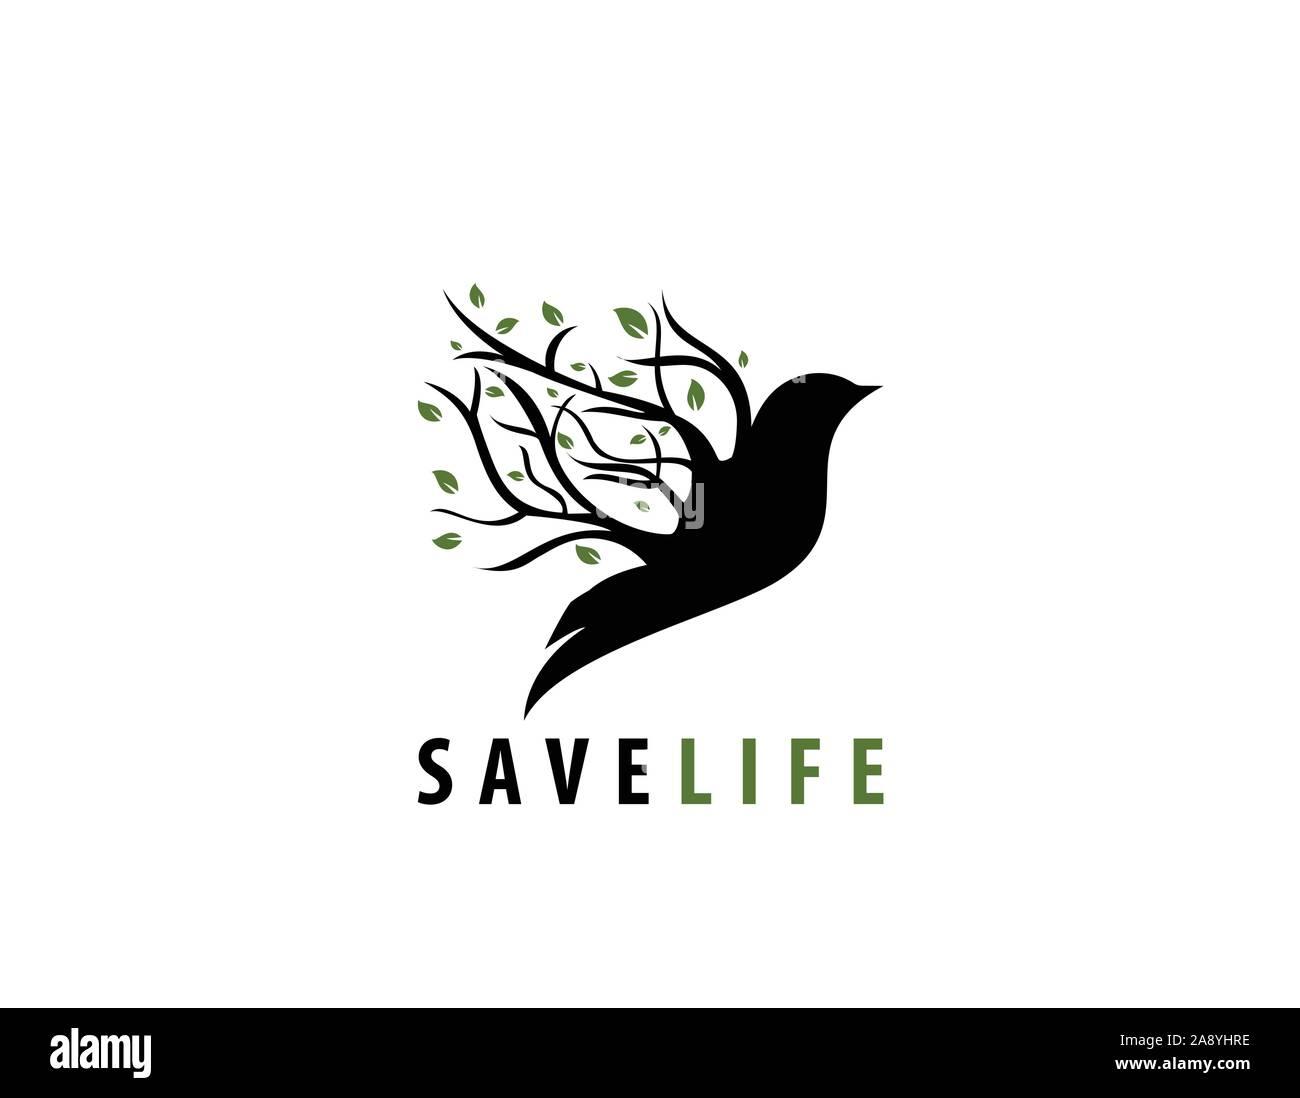 Save life bird tree vector- illustration Stock Vector